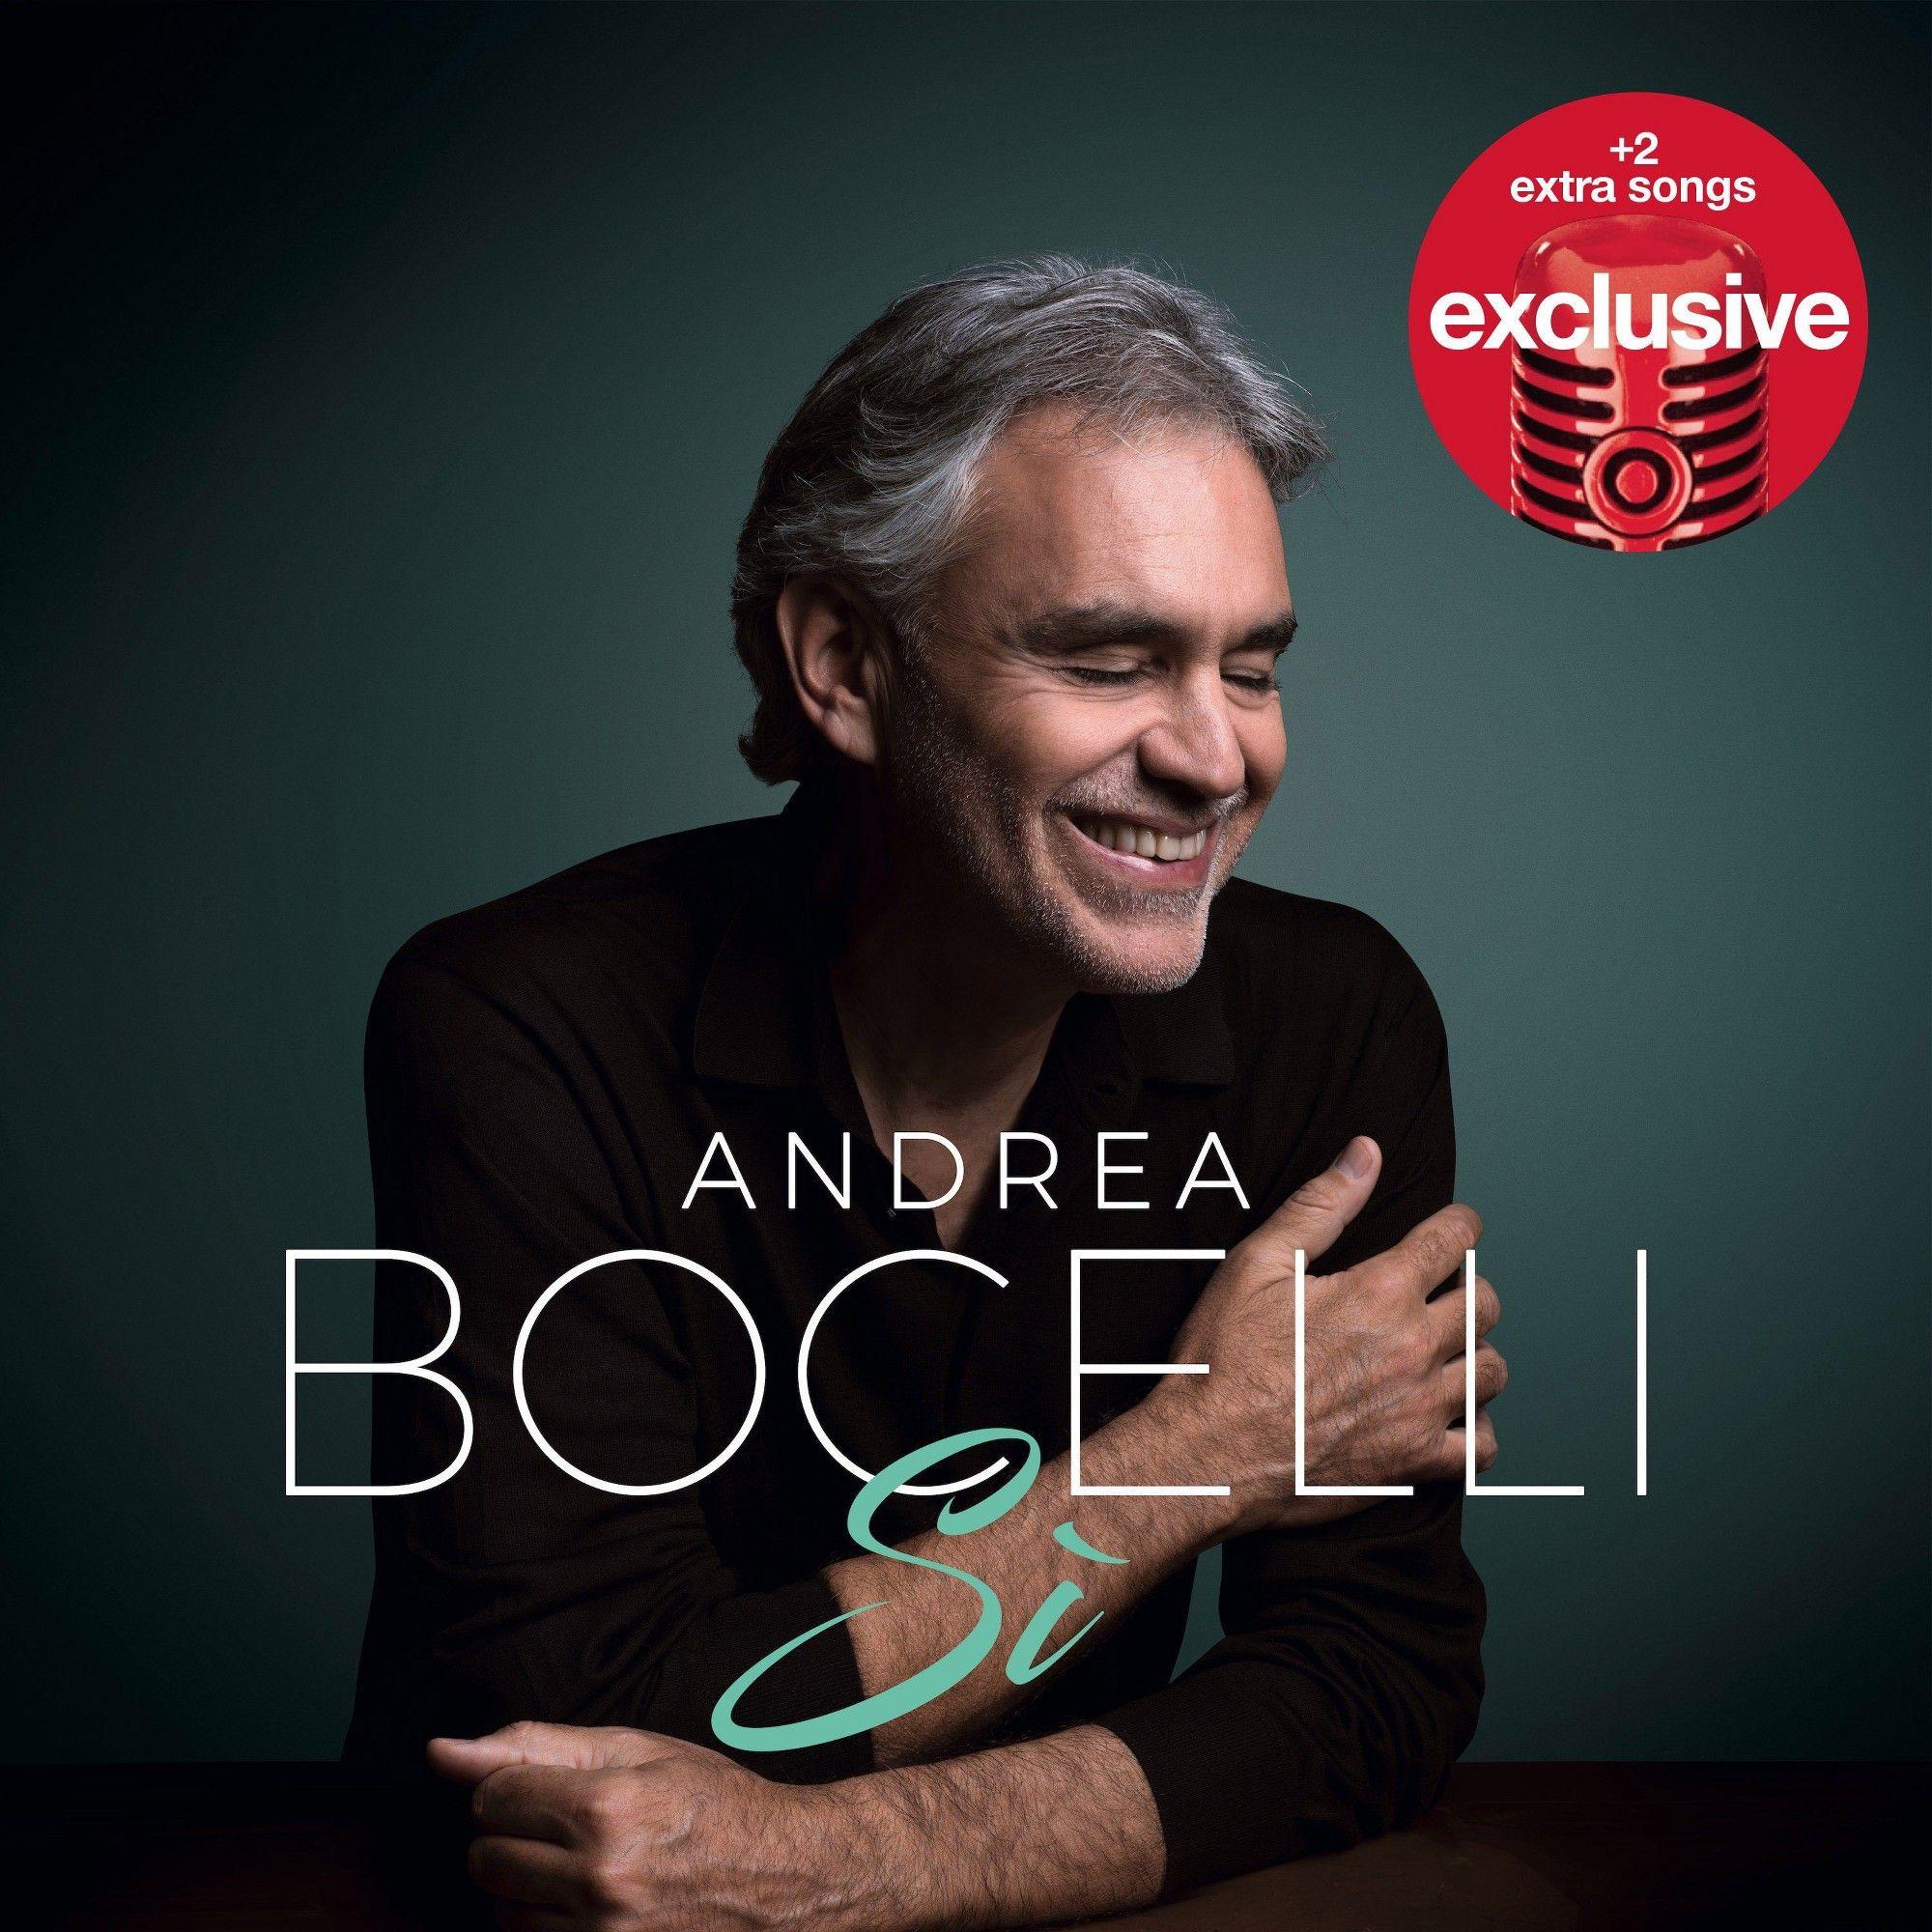 Andrea Bocelli Si Deluxe Target Exclusive Target Exclusive